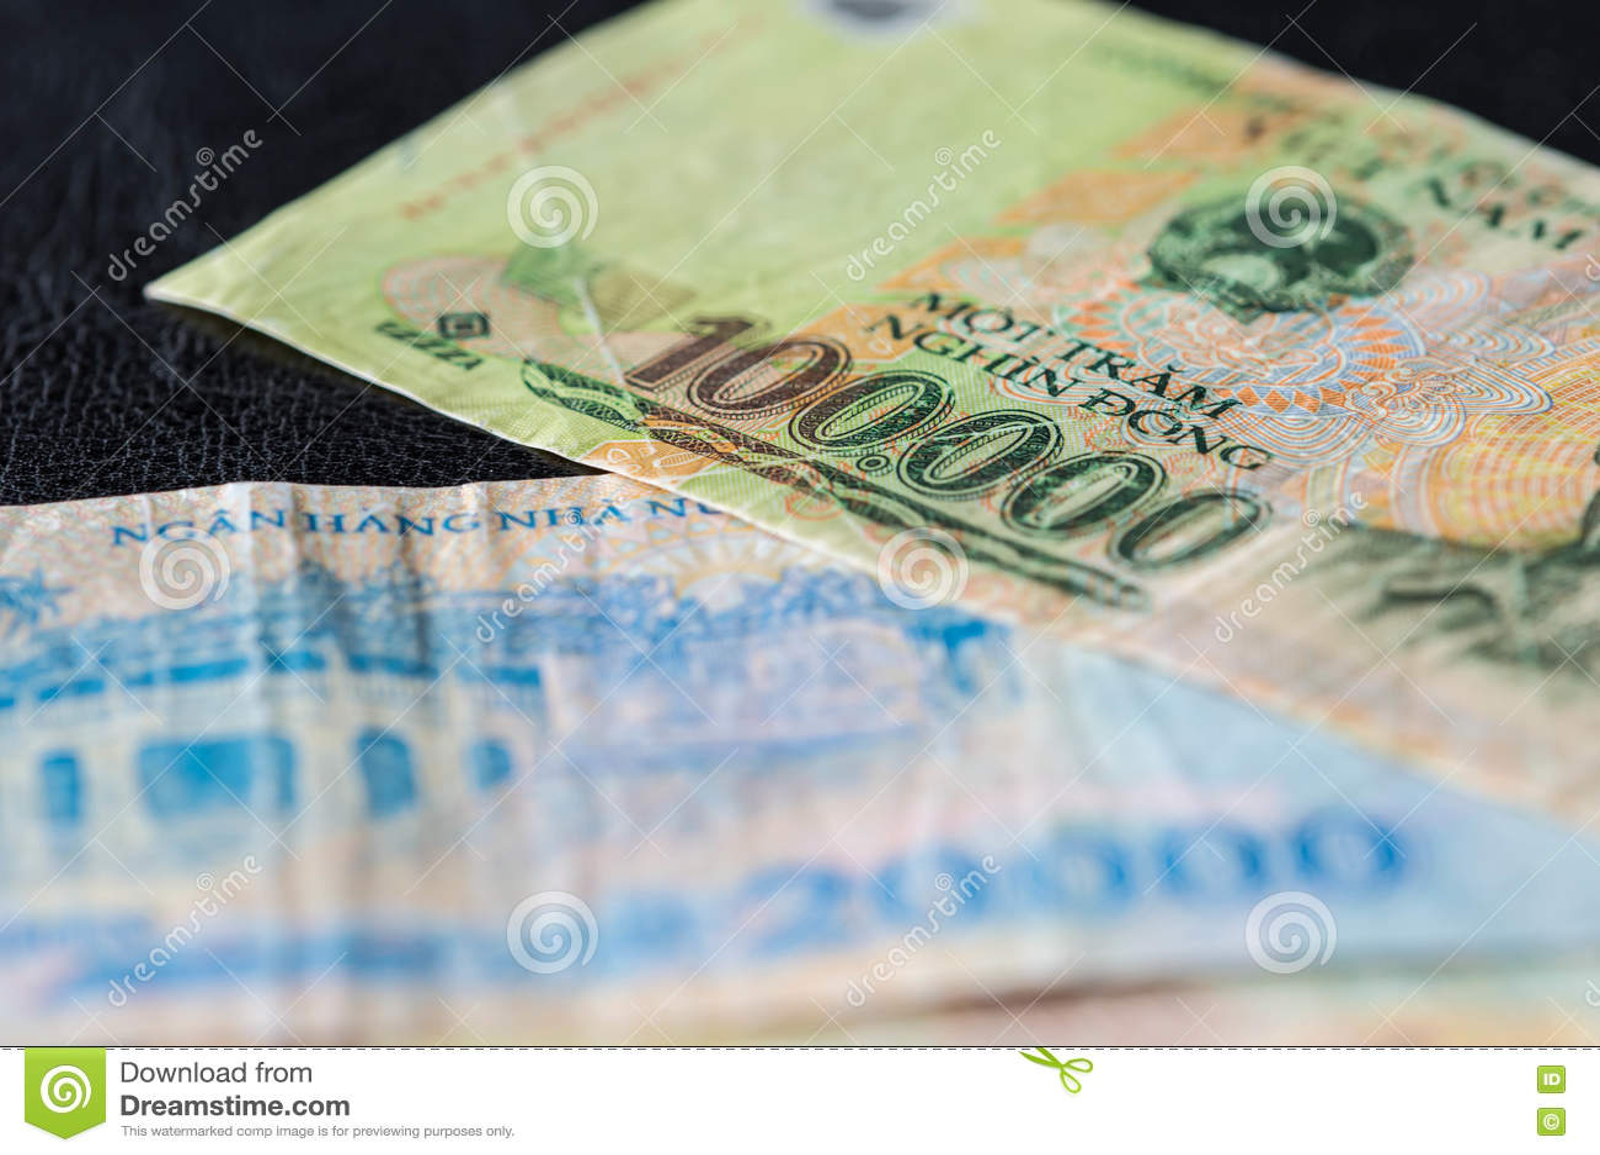 Vietnamese banknote of 100,000 VND